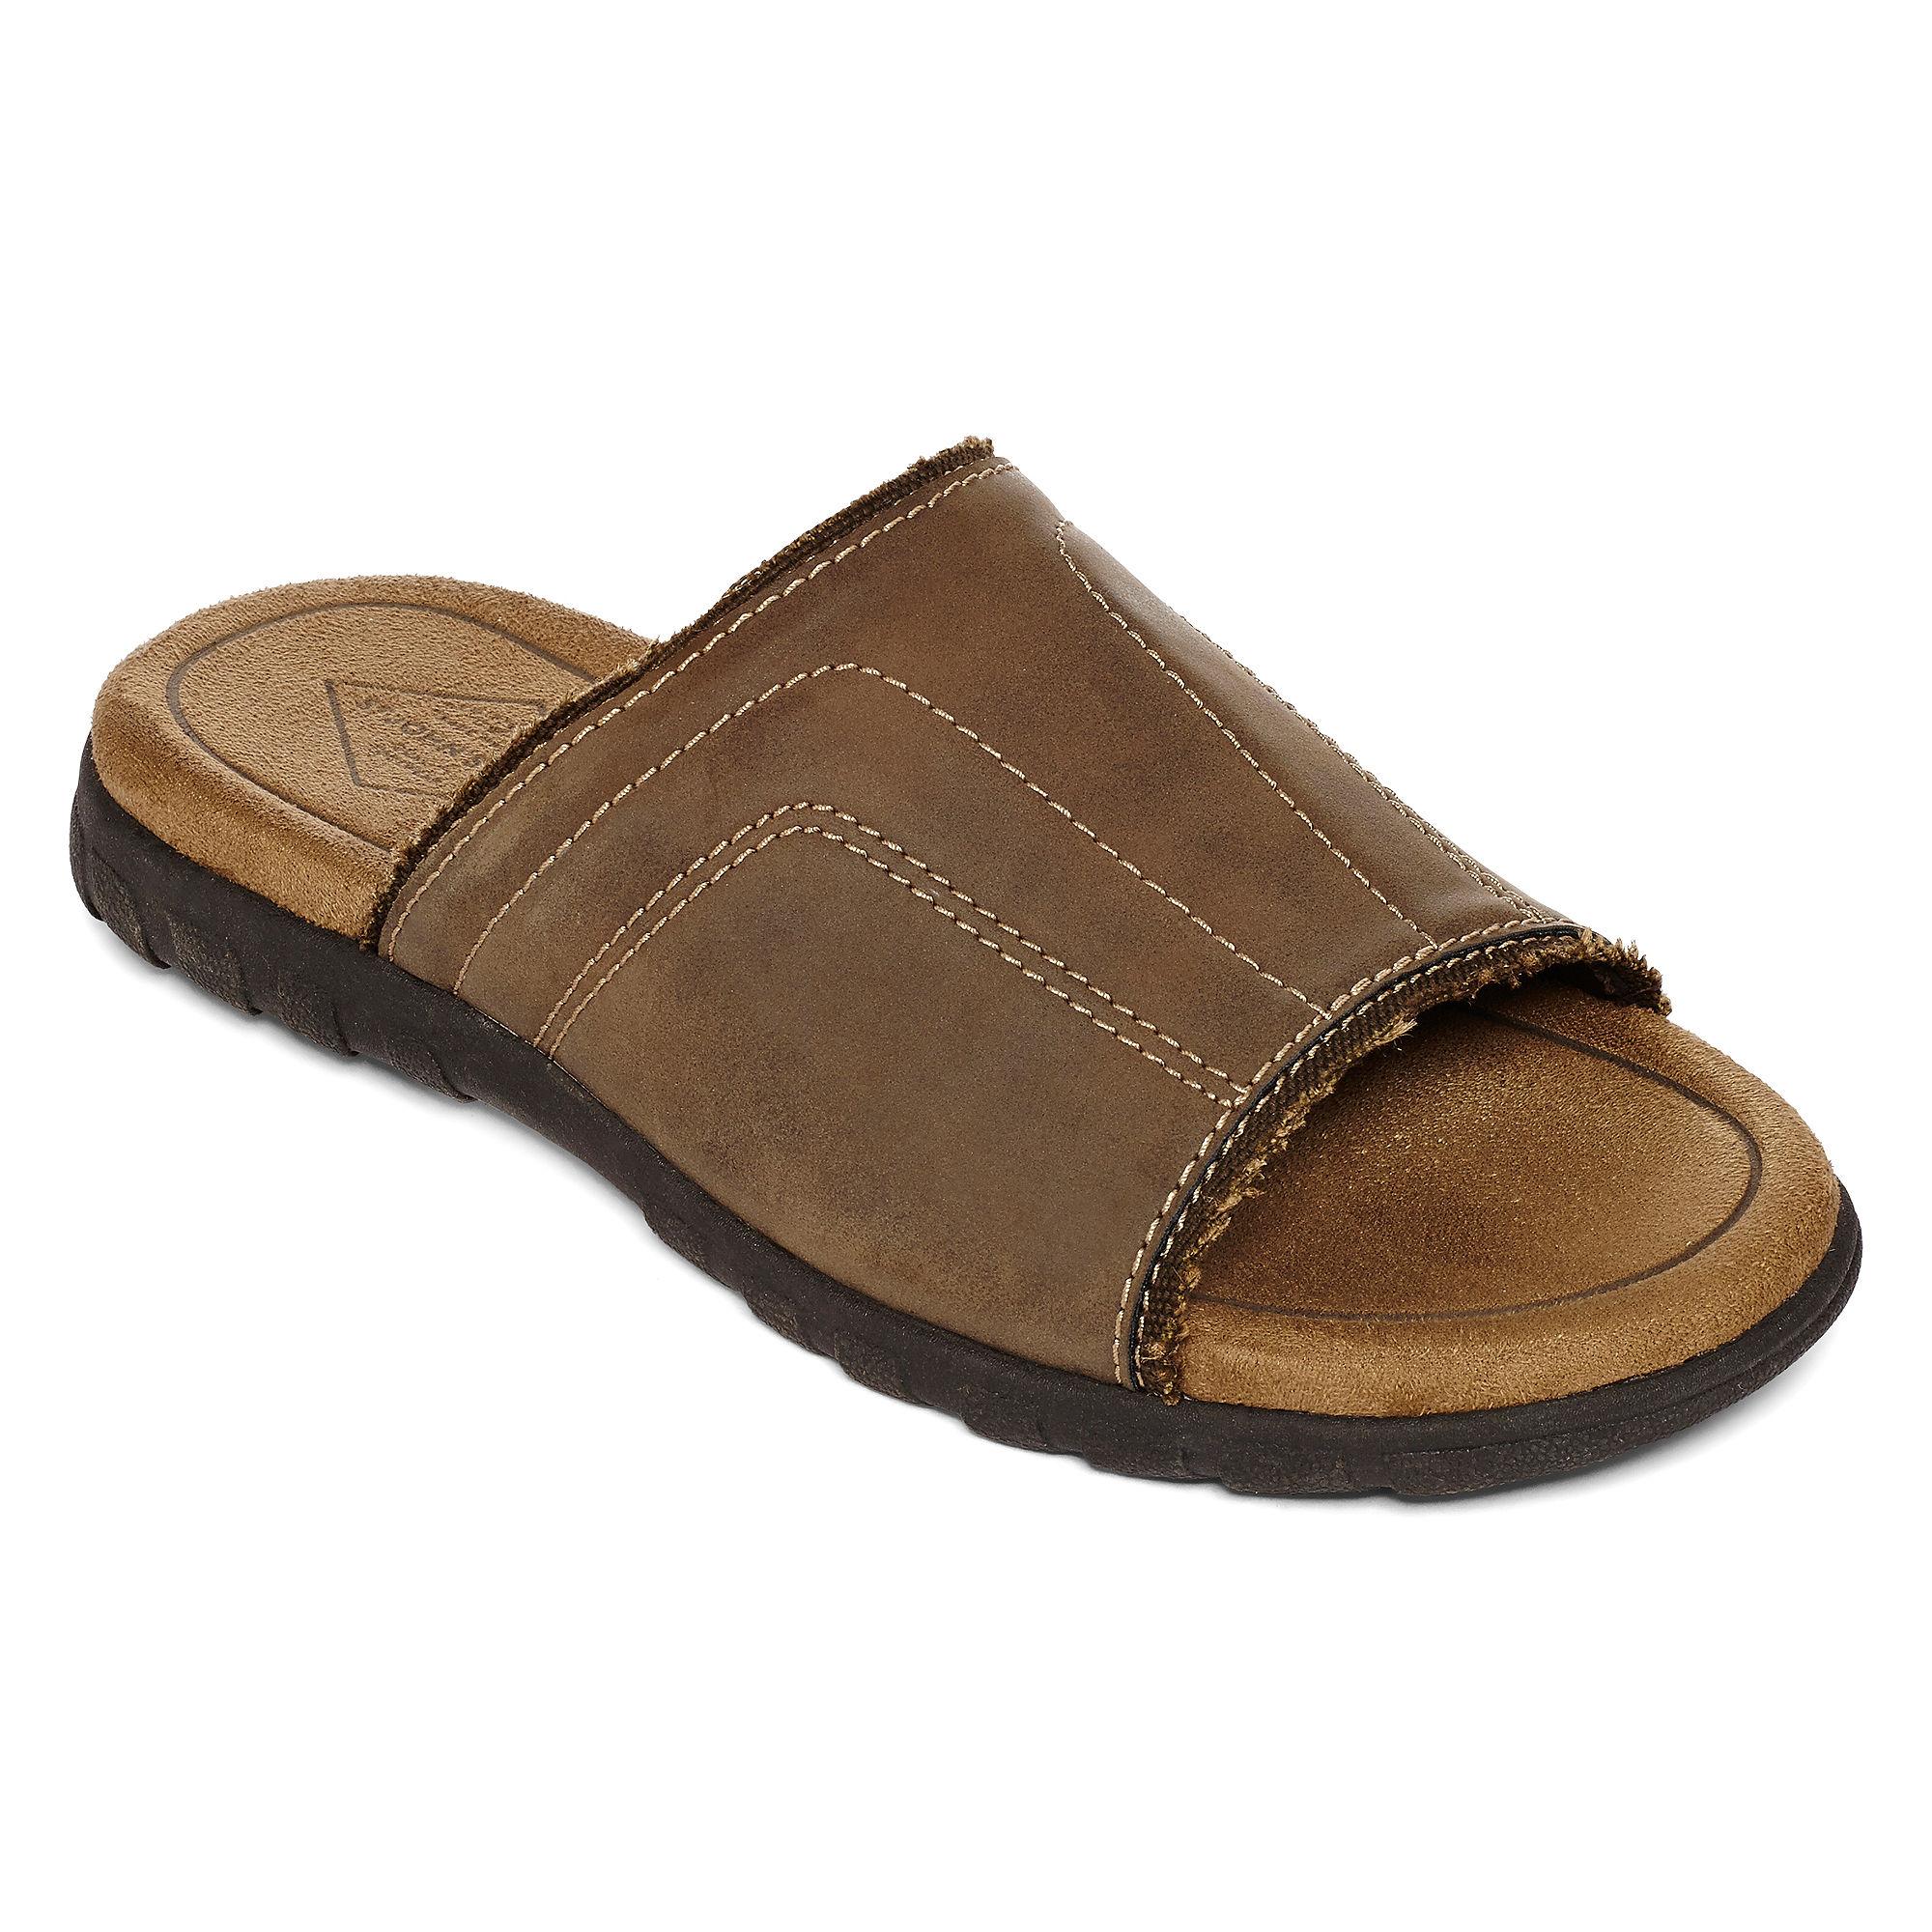 St John S Bay Ballast Shoe